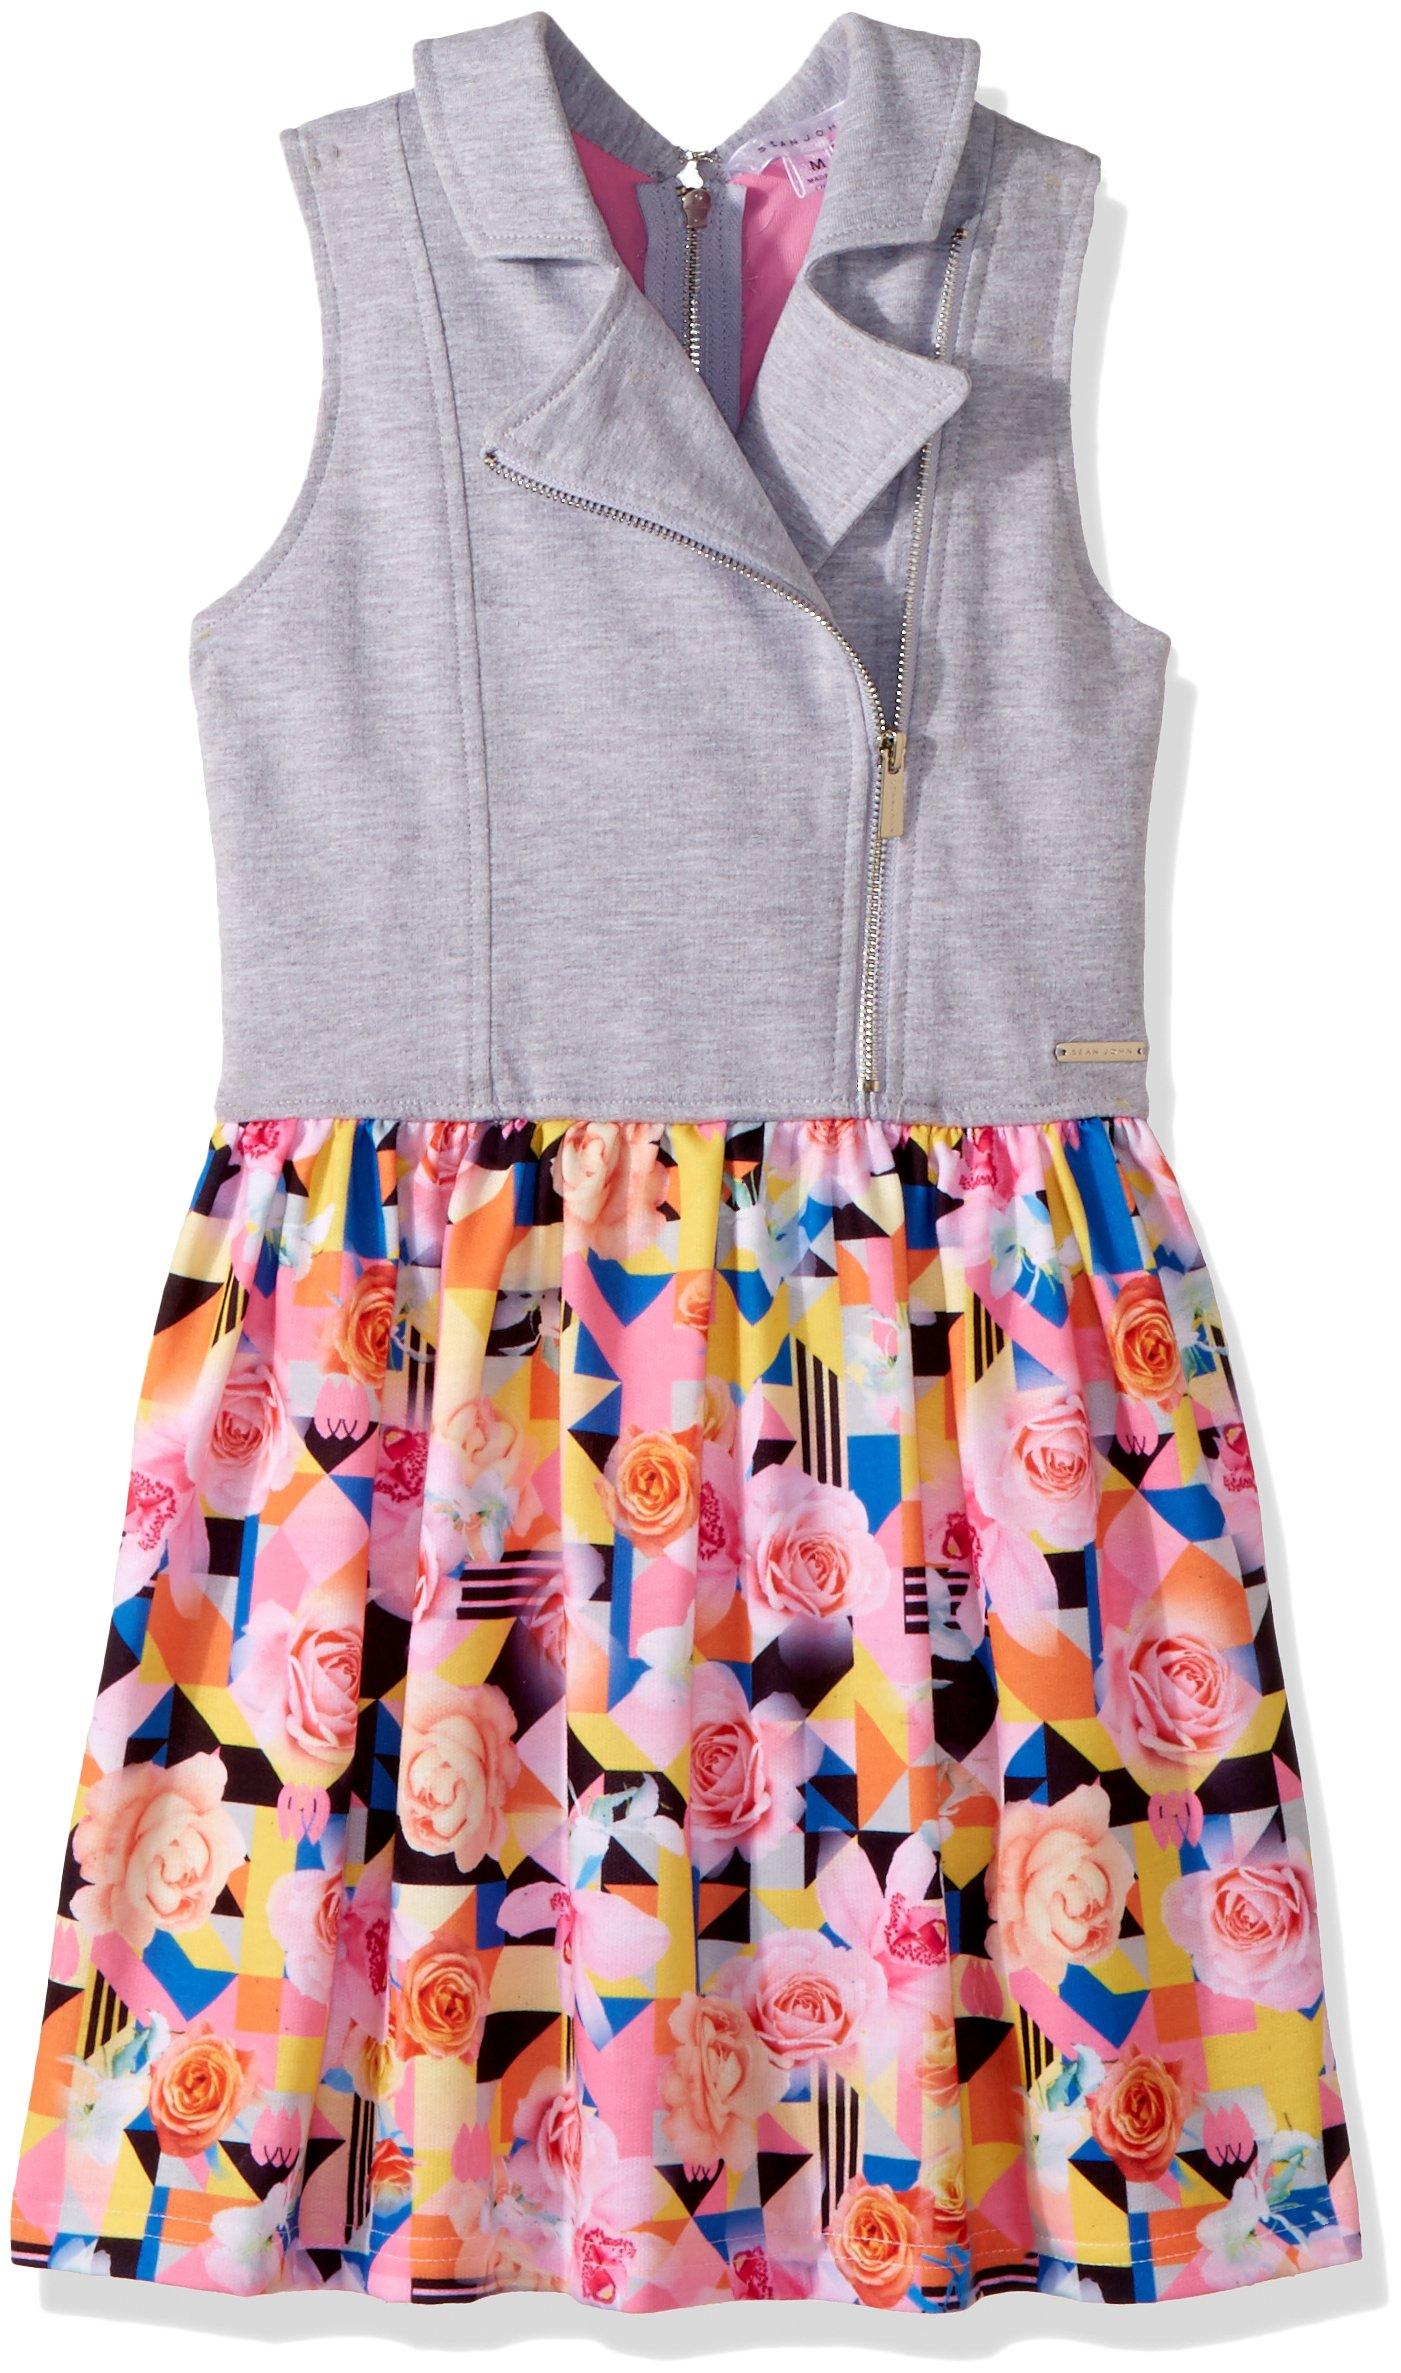 Sean John Big Girls' Tropical Geo Traveler Vested Dress, Multi, L by Sean John